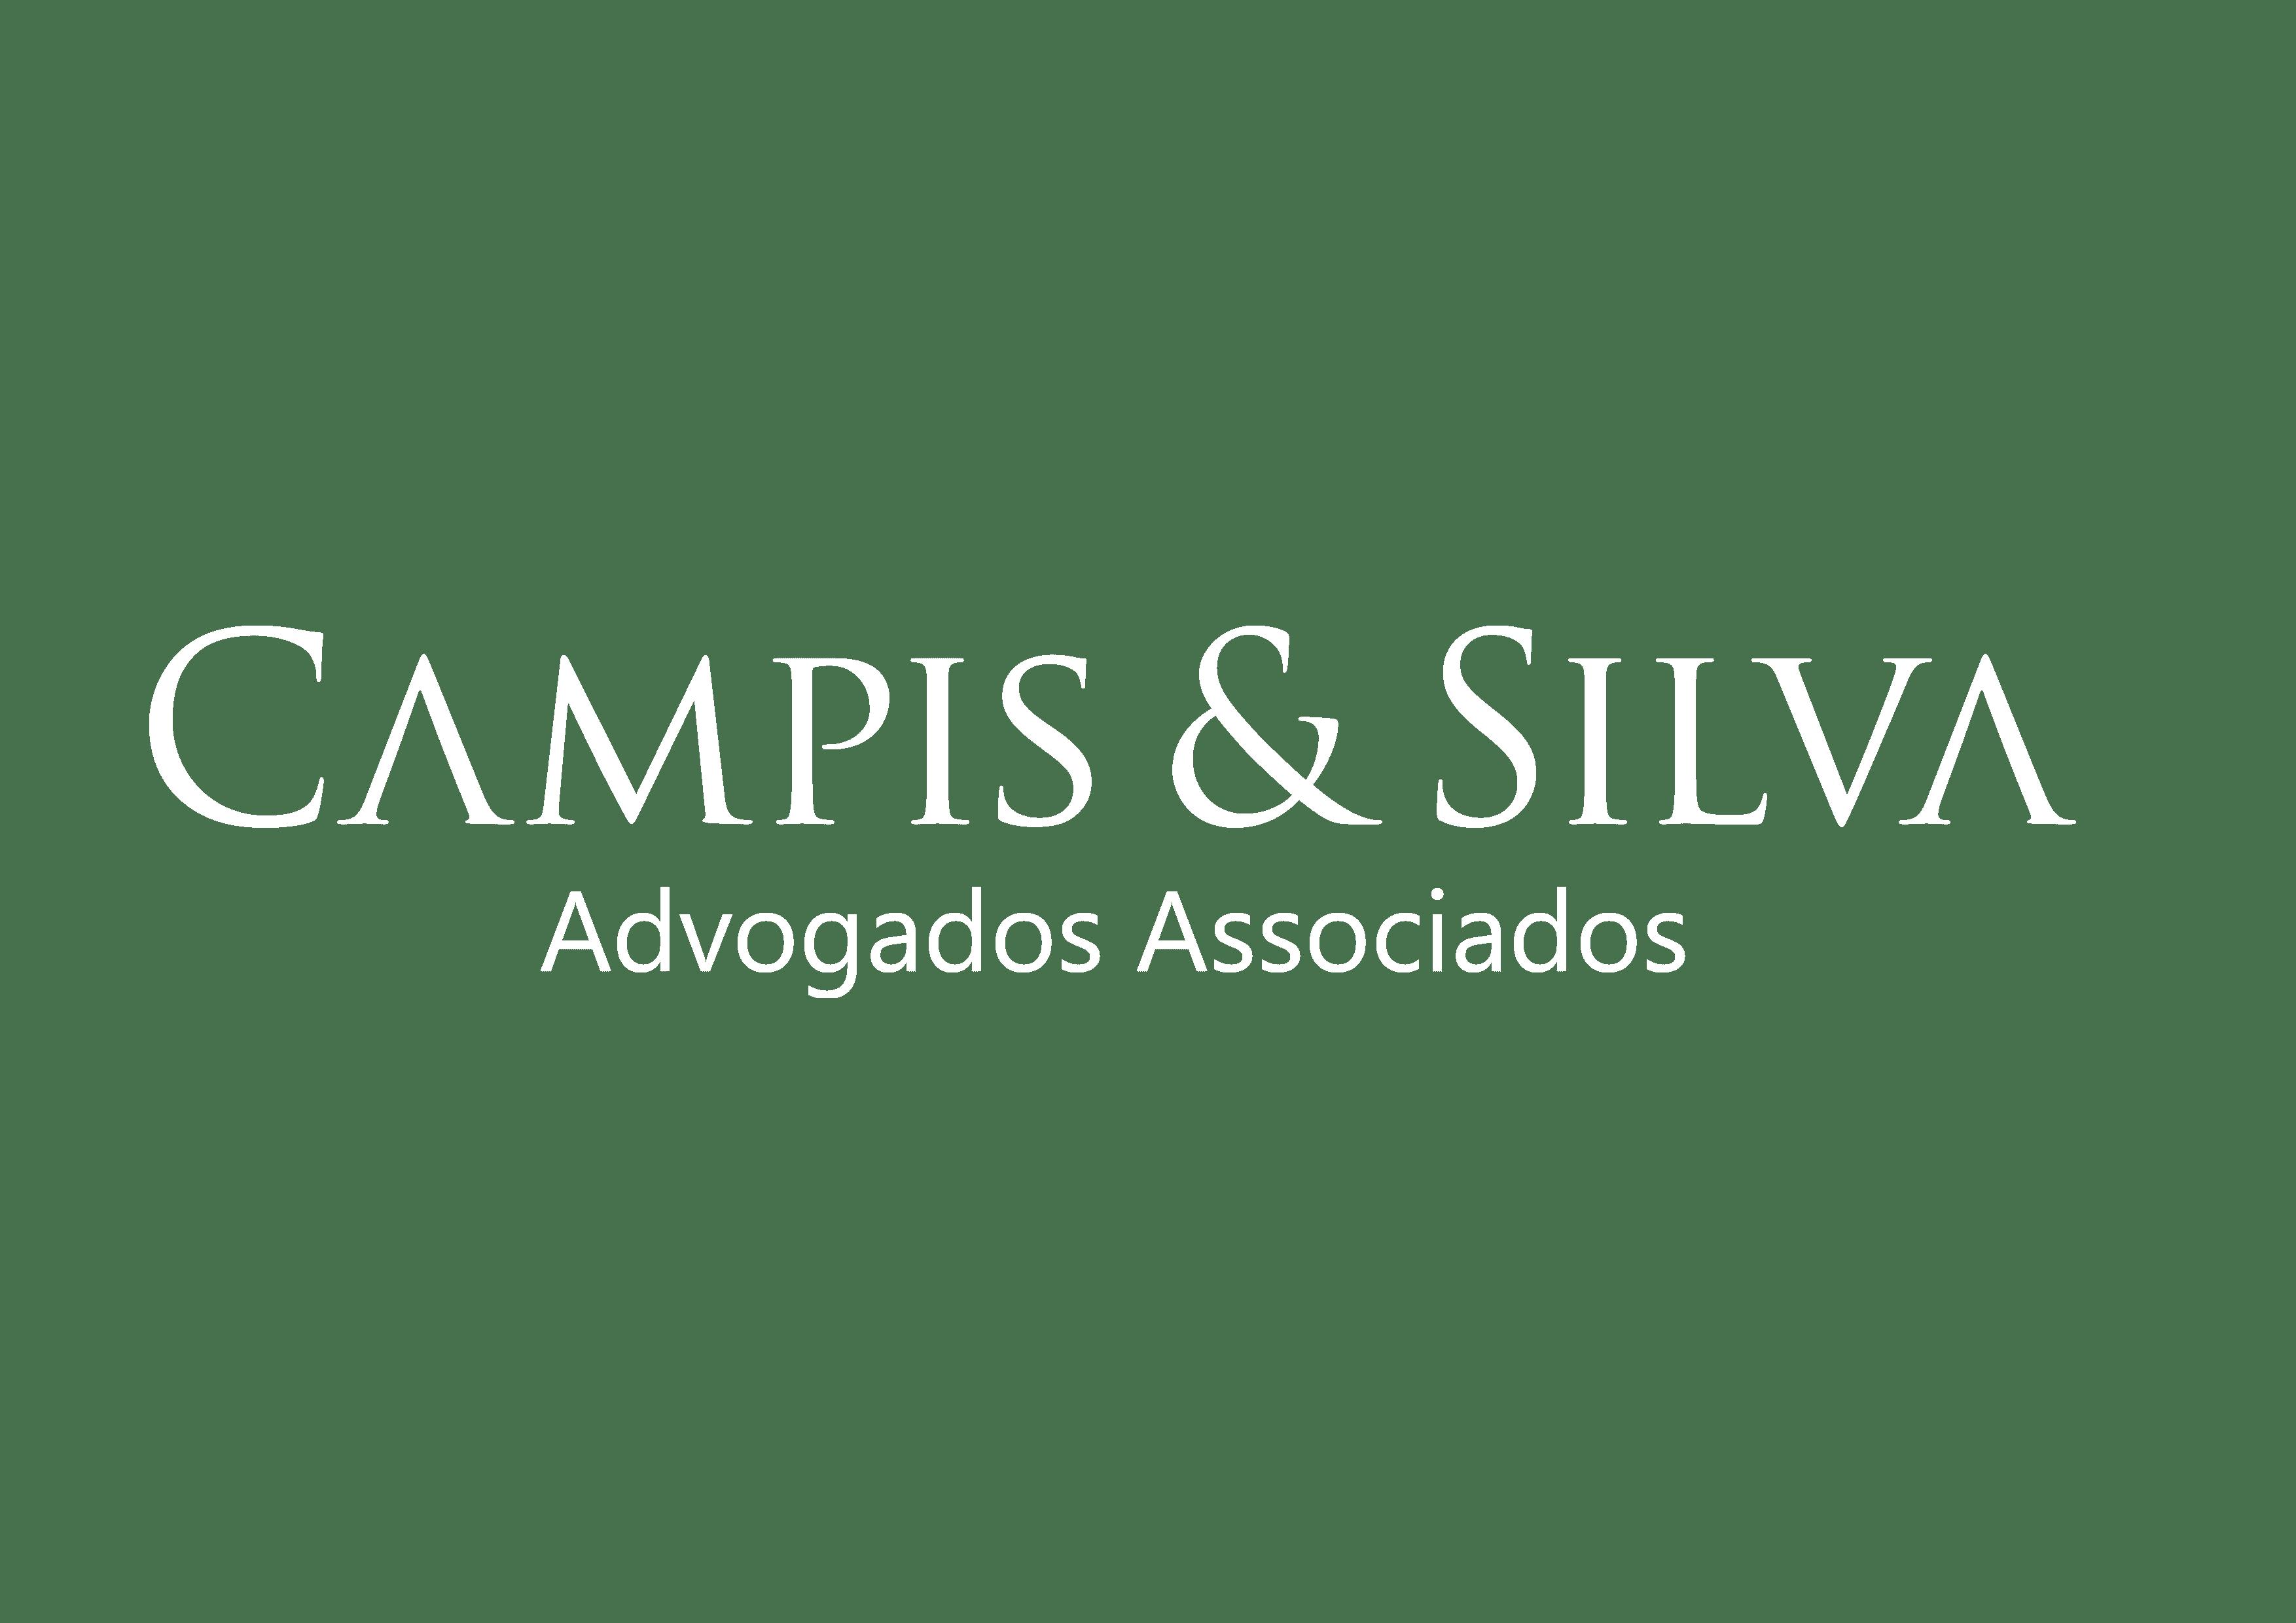 Campis & Silva